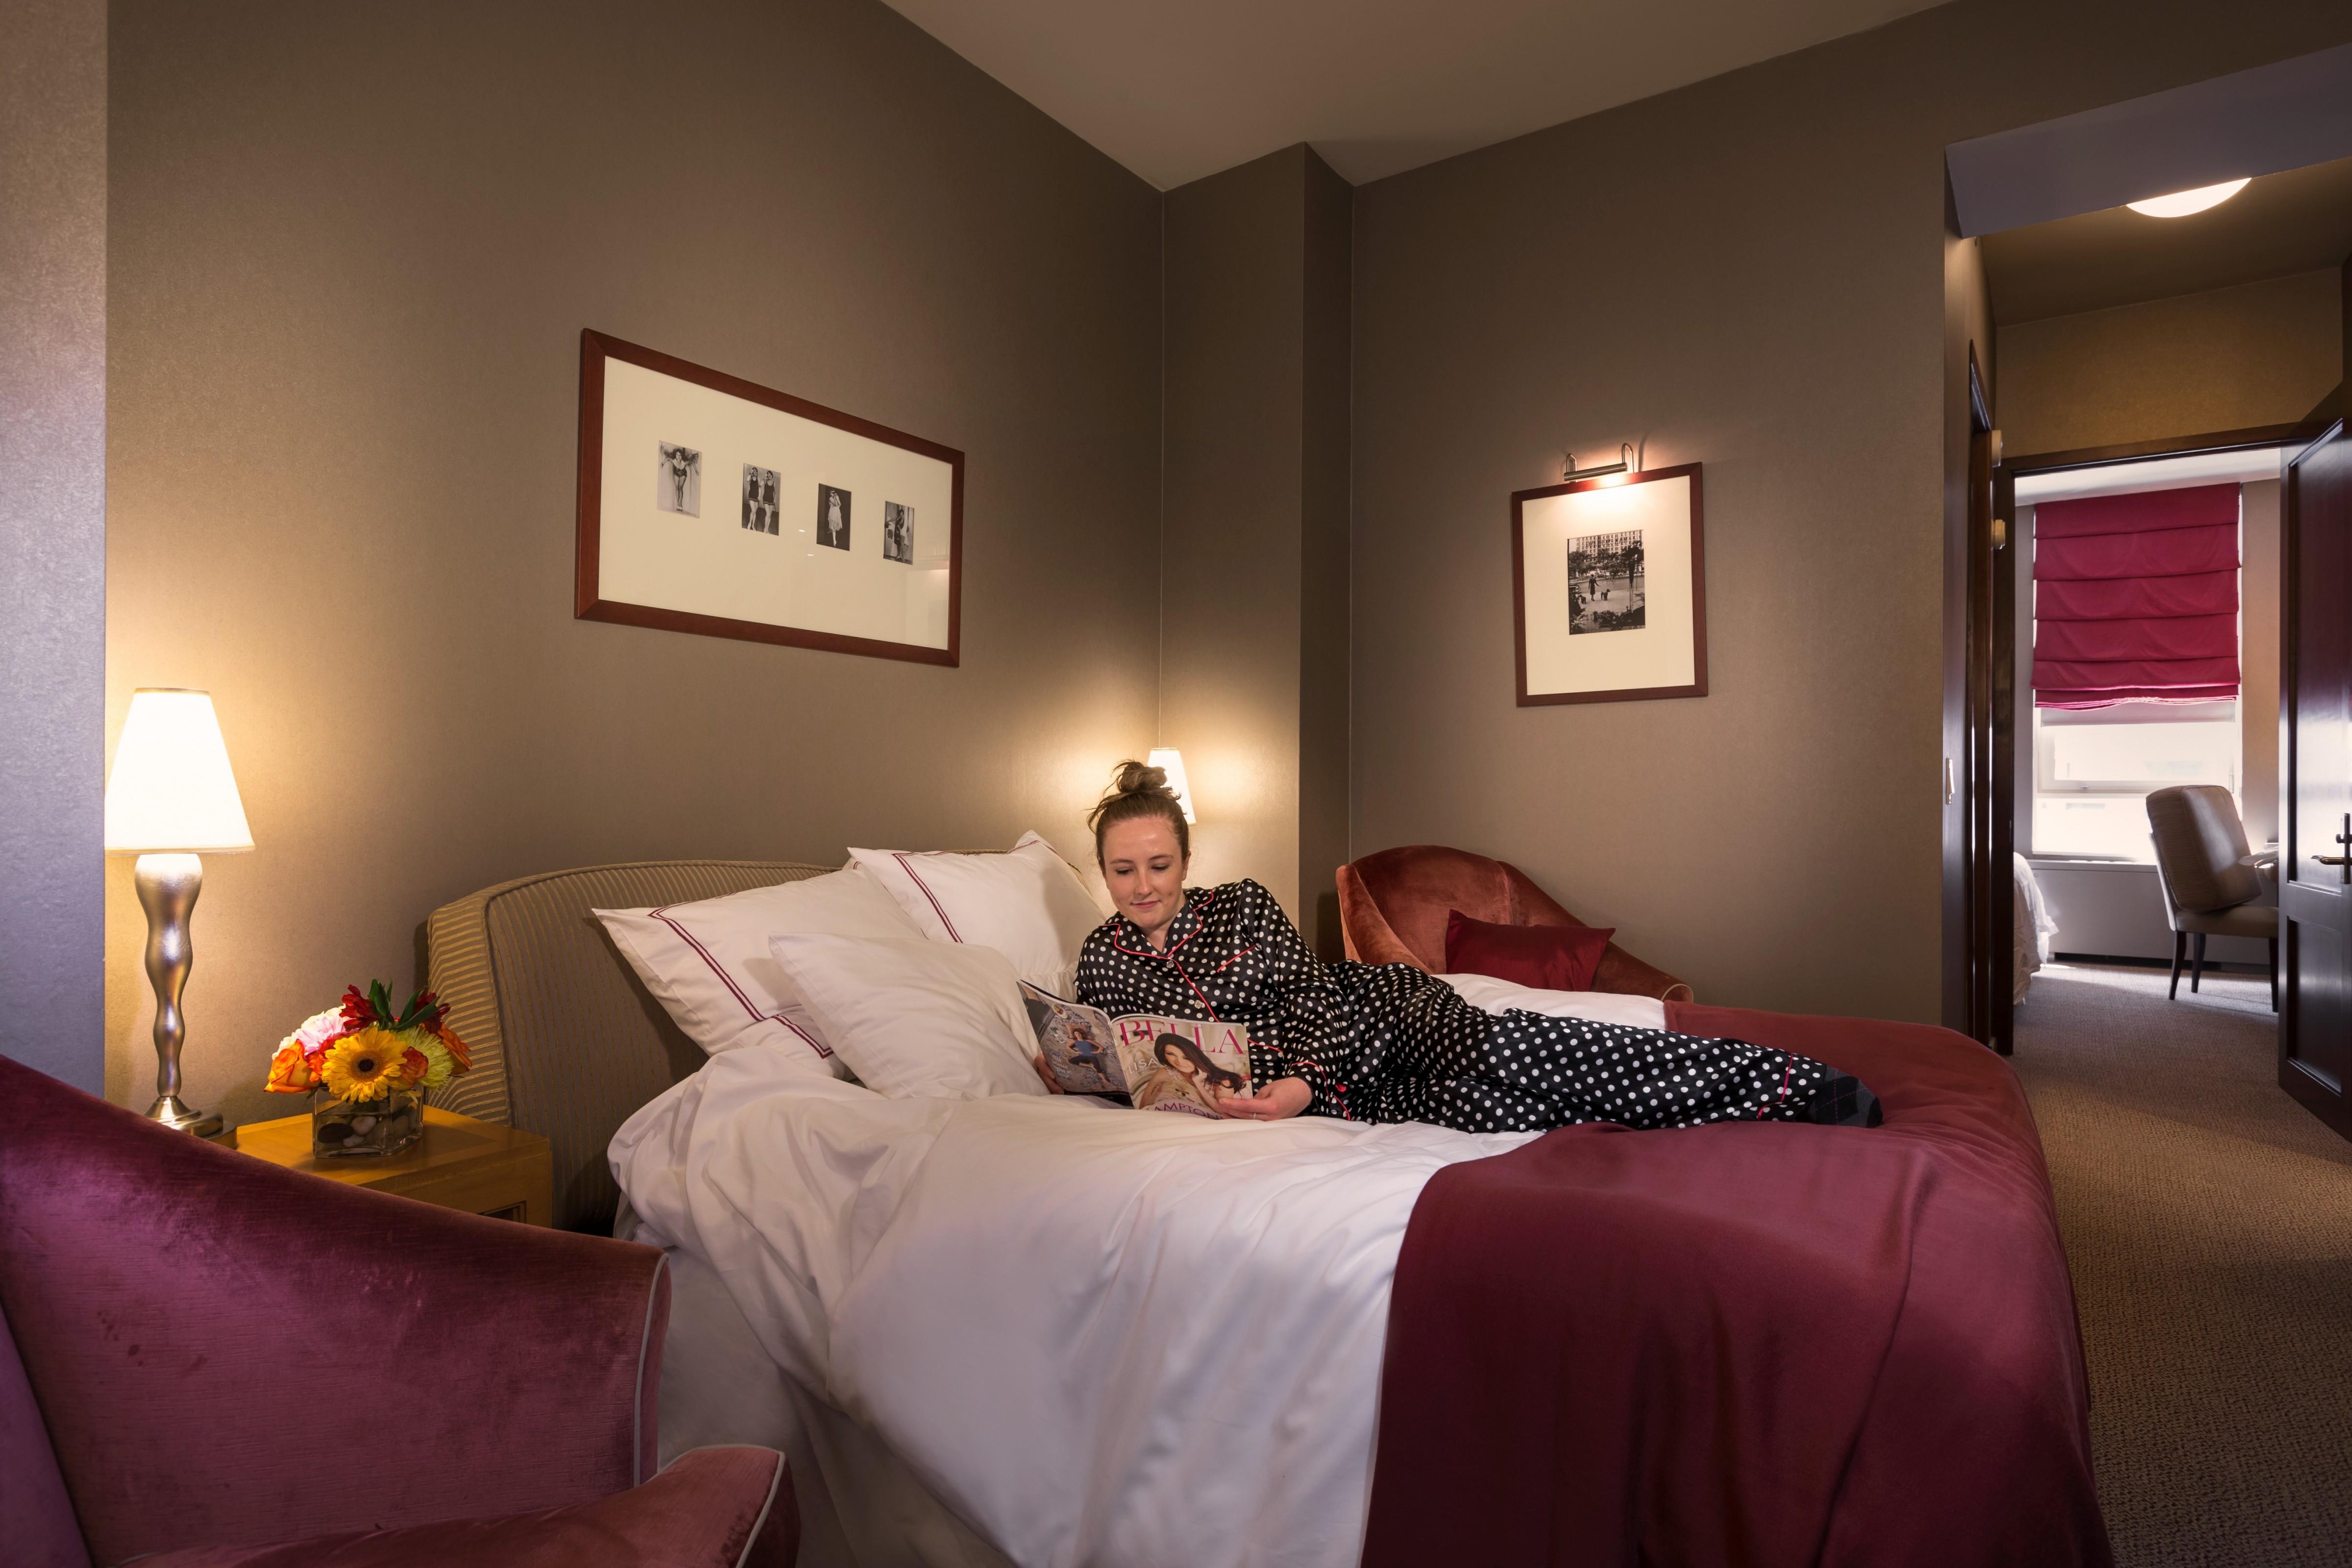 Hotel Giraffe New York City  Luxury Hotel NYC  Classic King Suite